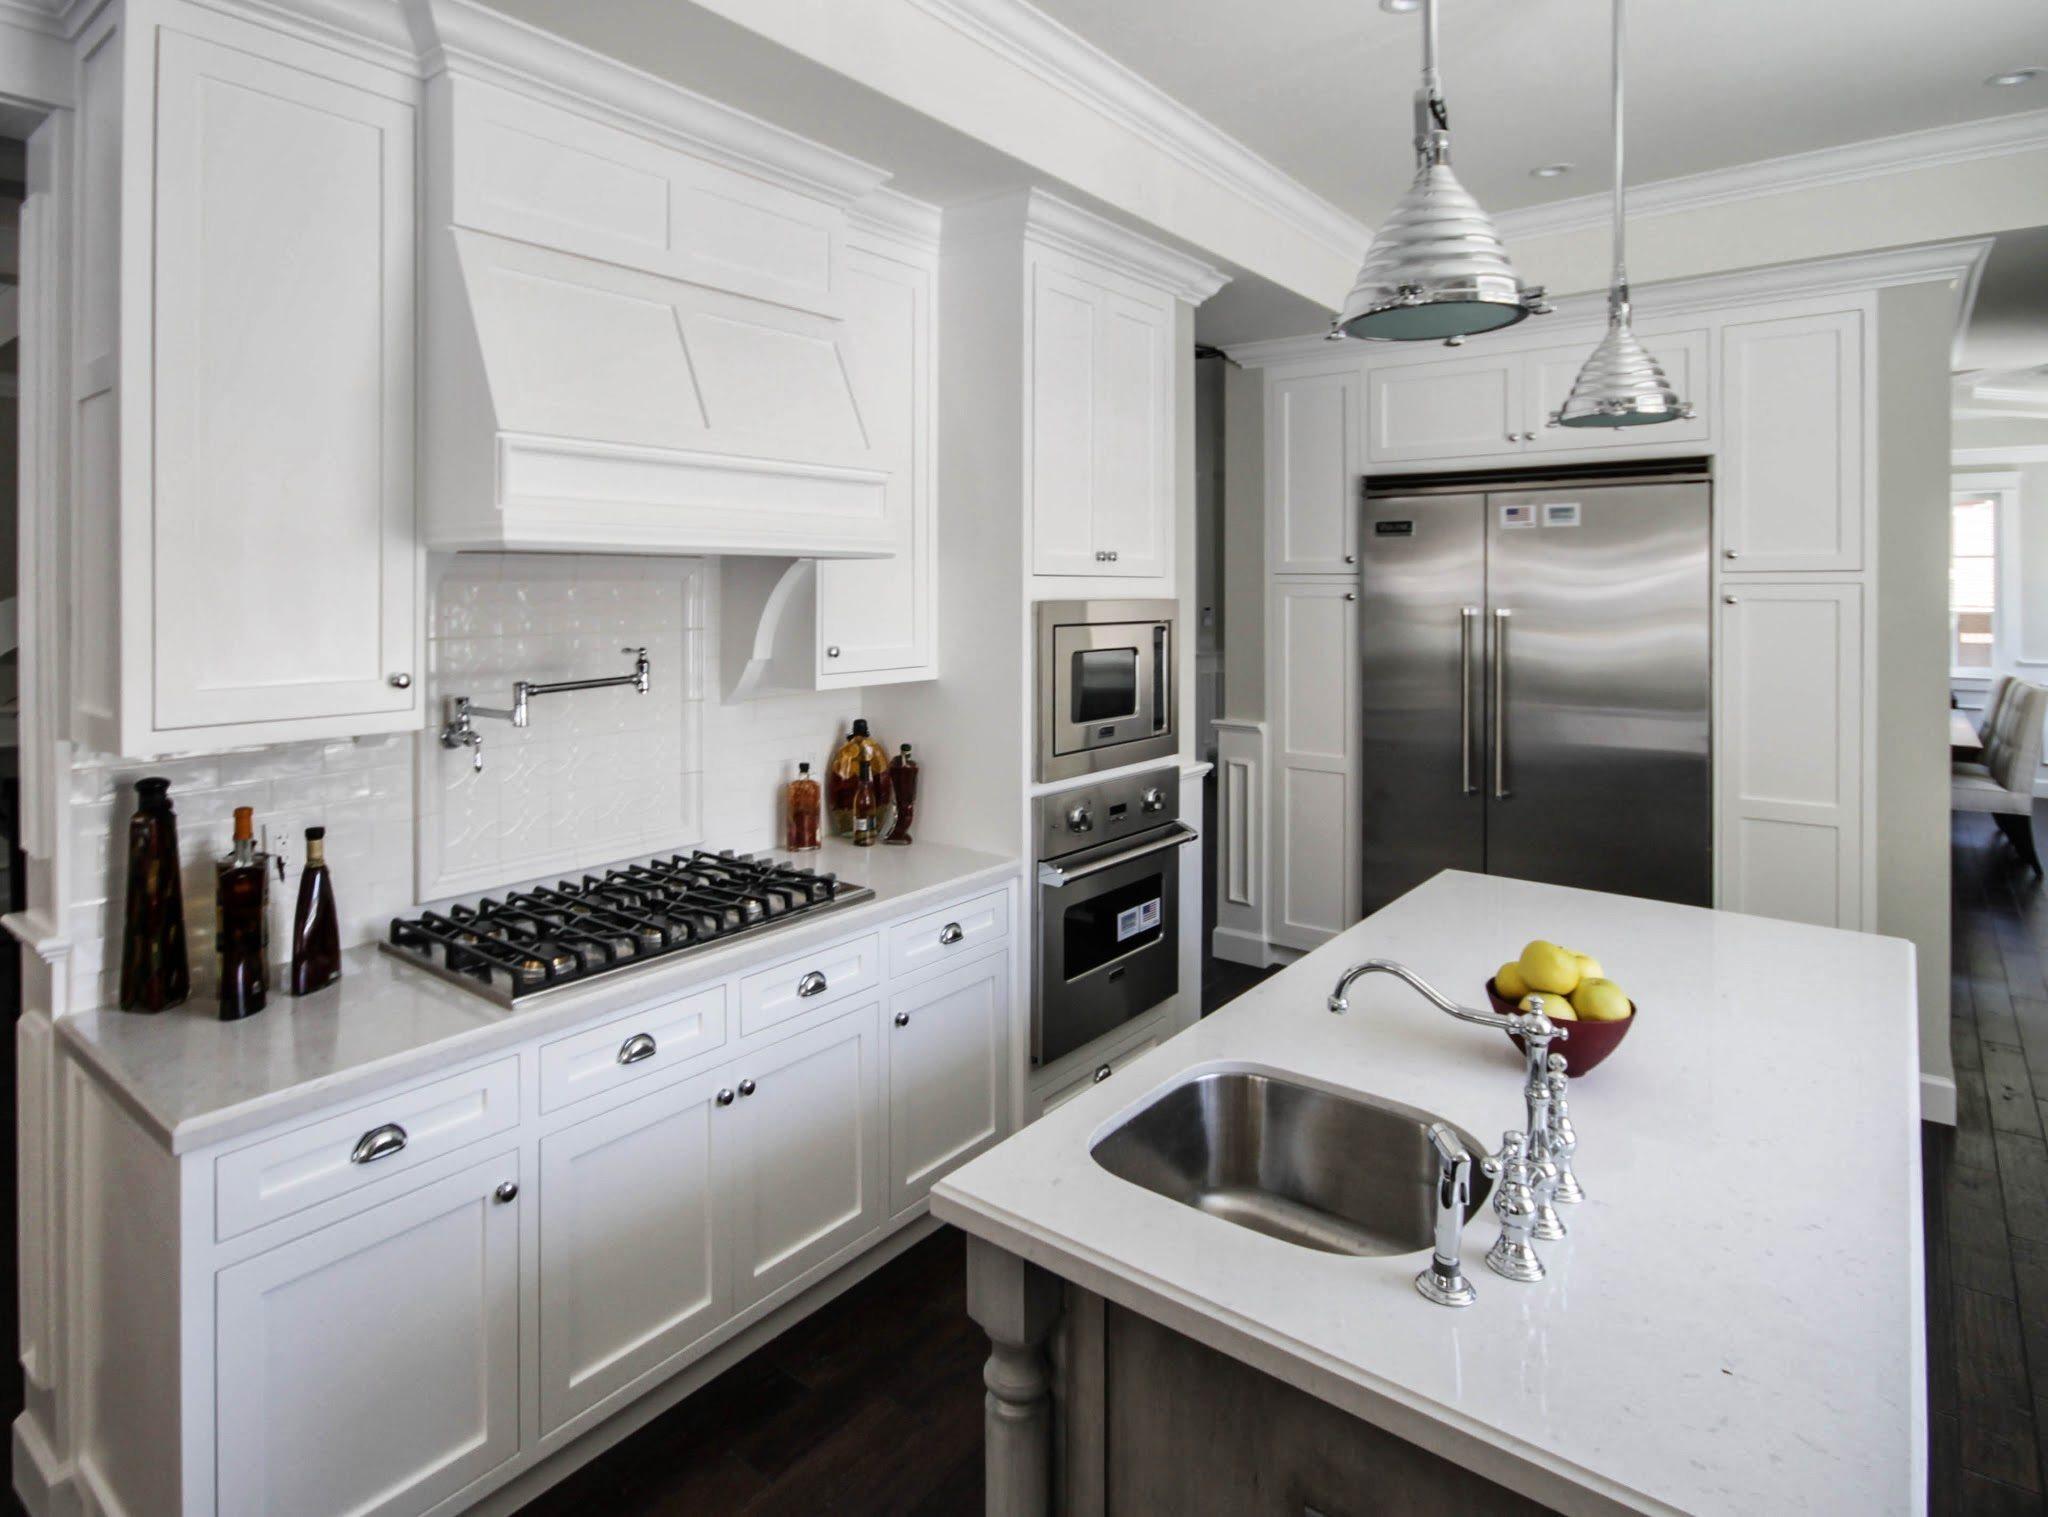 Kitchen Remodeling Where To Start Greenworks Construction - Where to start when remodeling a kitchen